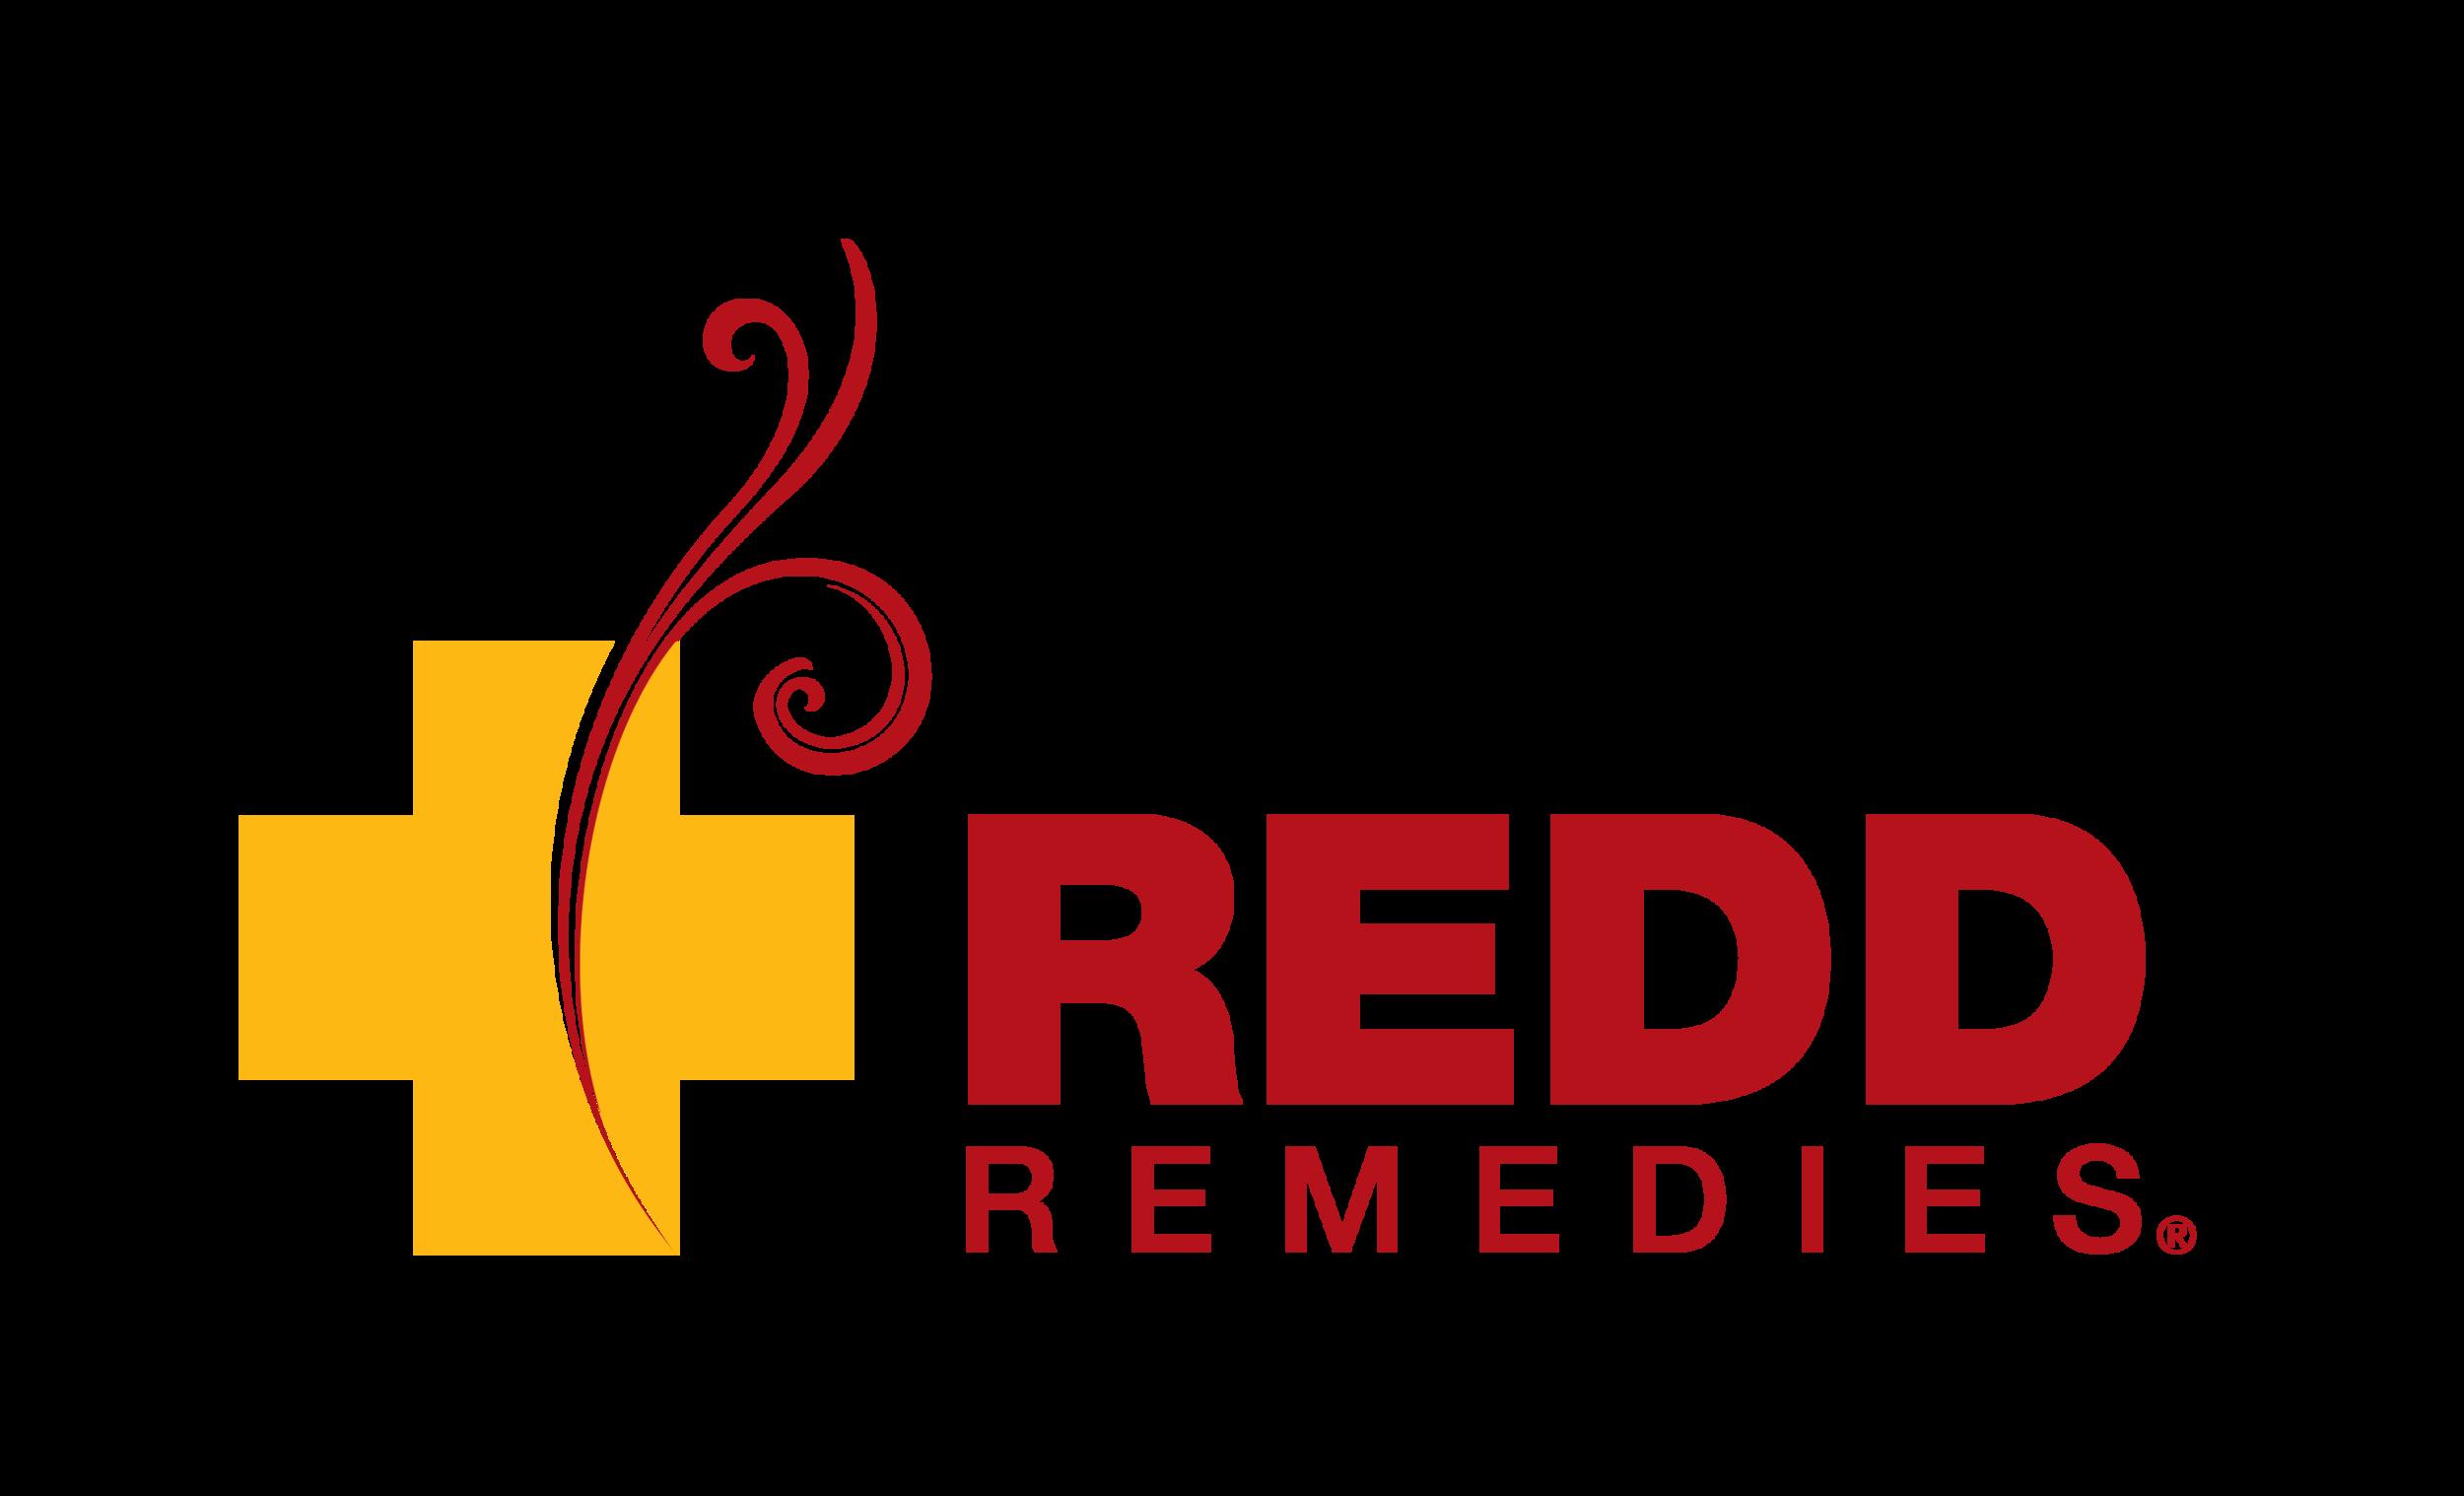 ReddRemedies_Logos_0815_Horiz Full.png